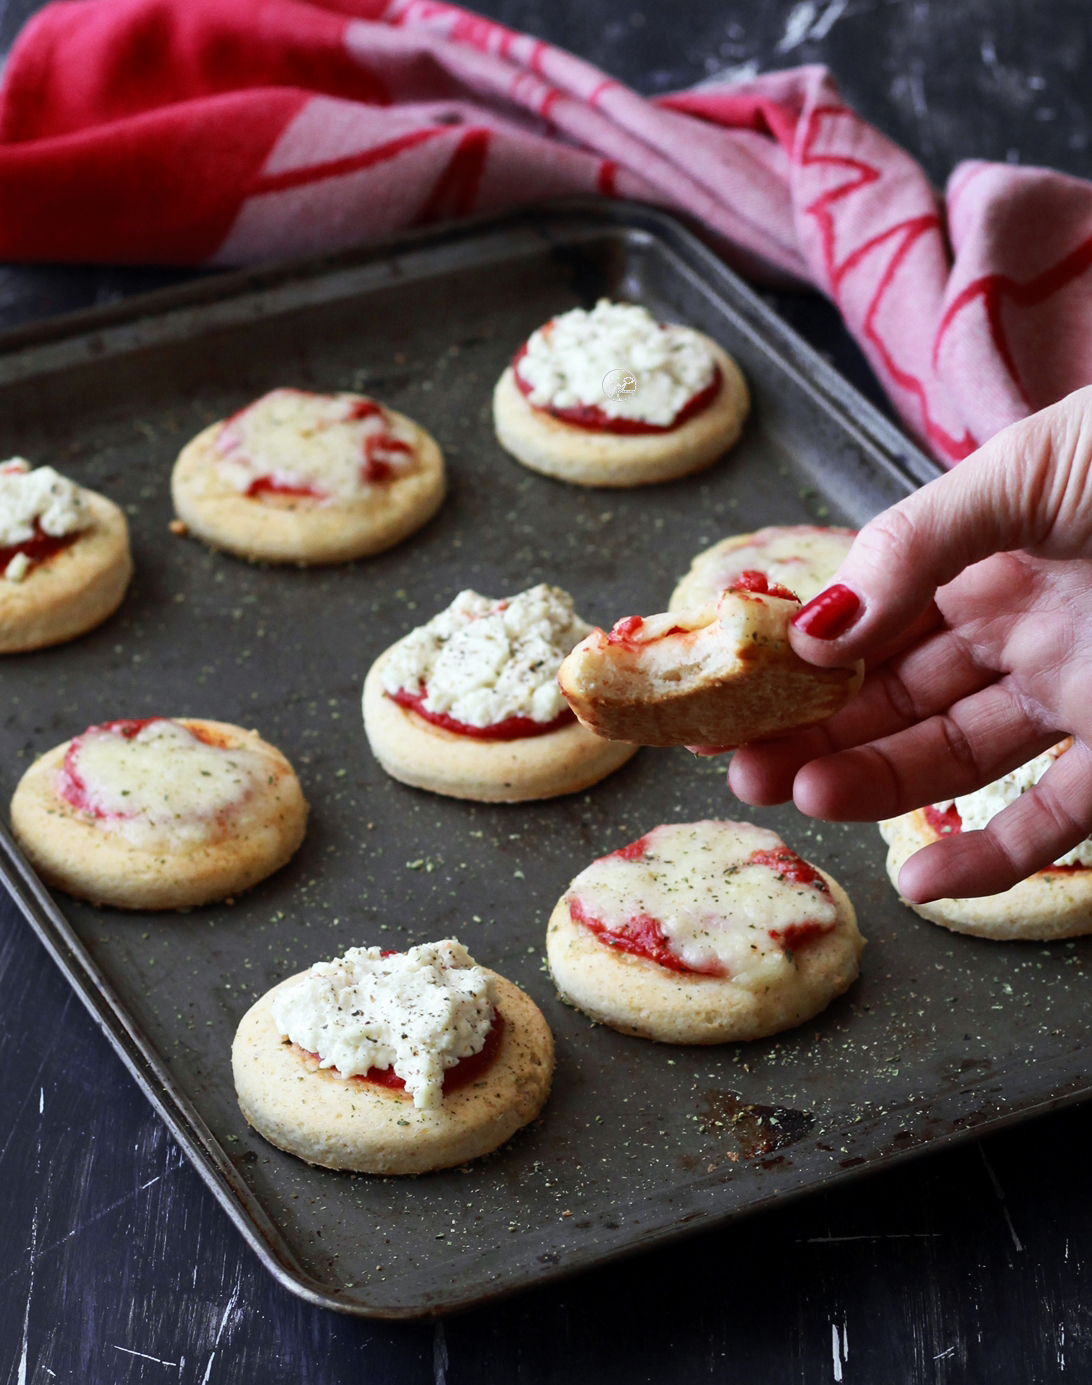 Pizzette alla ricotta senza glutine - La Cassata Celiaca